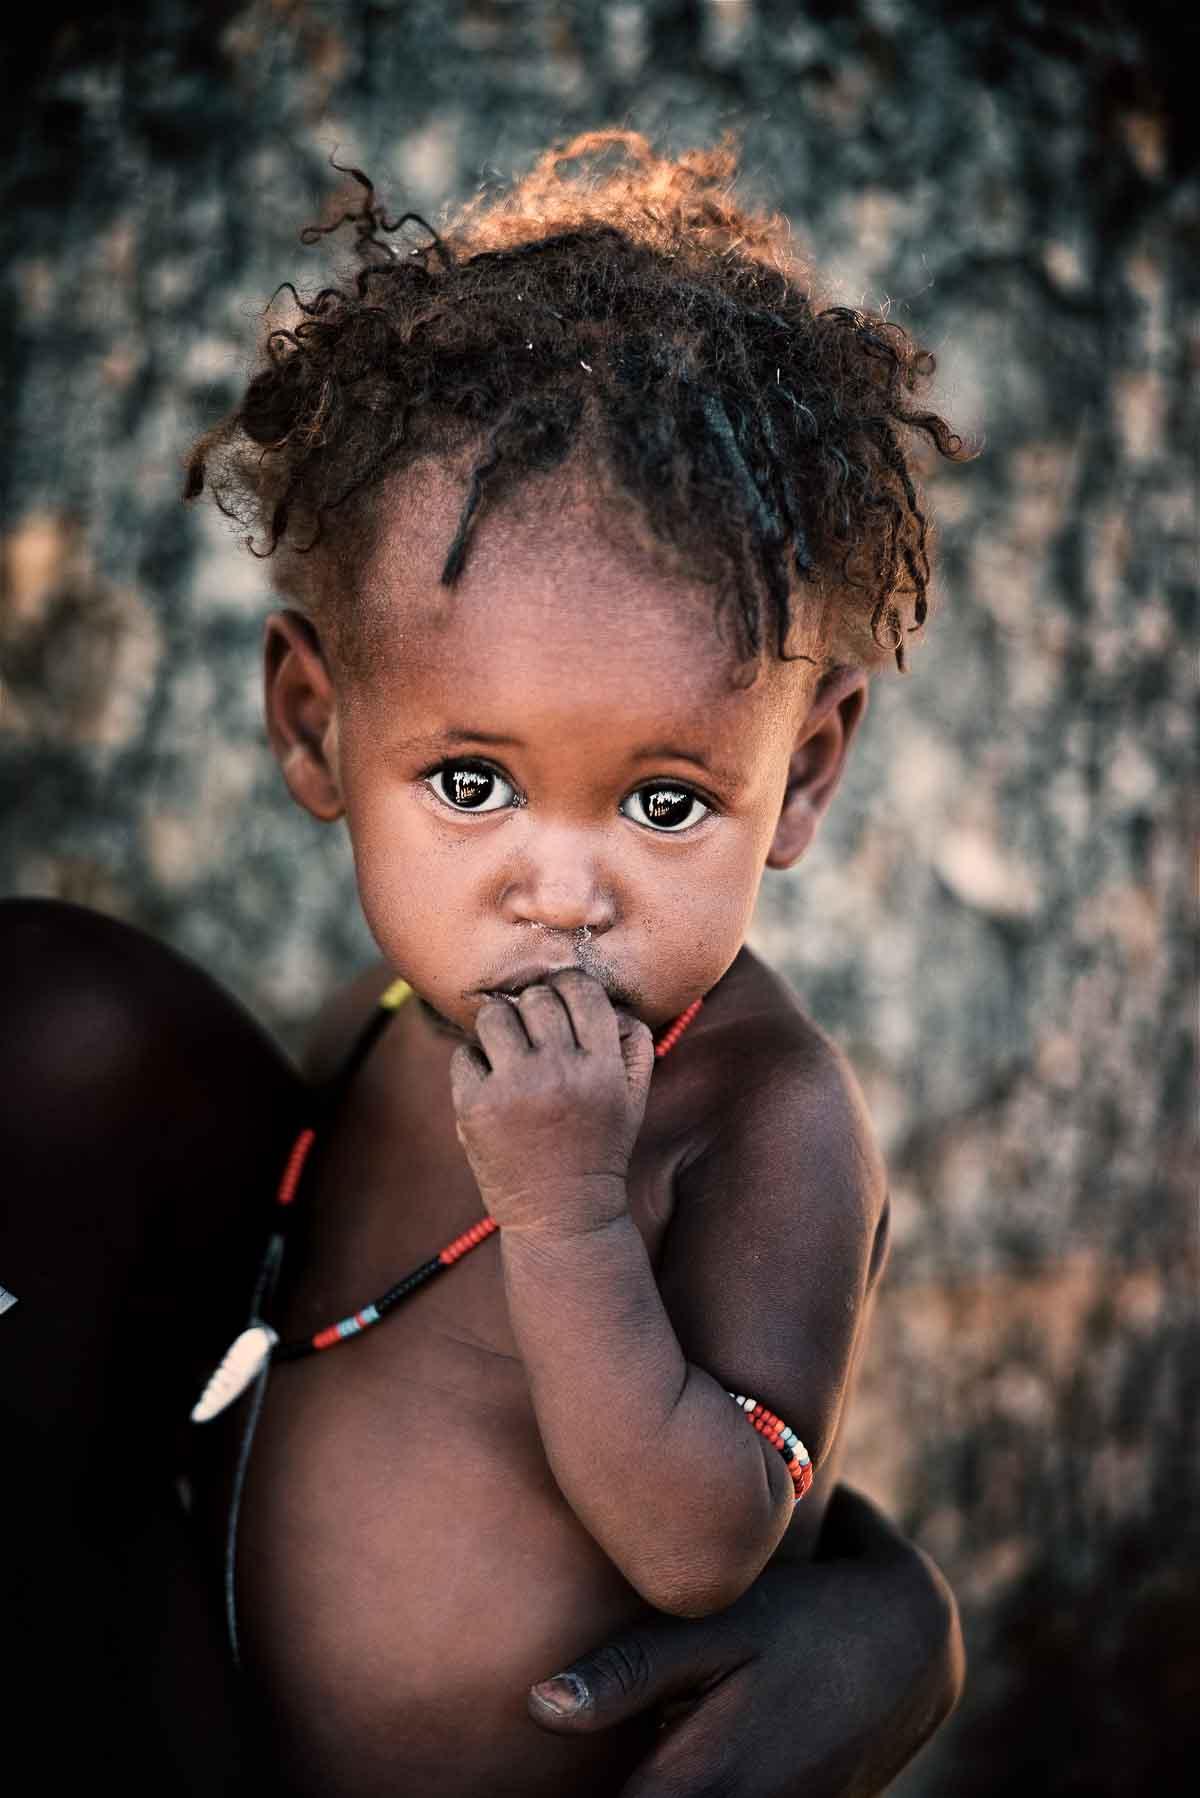 Baby Erbore girl too